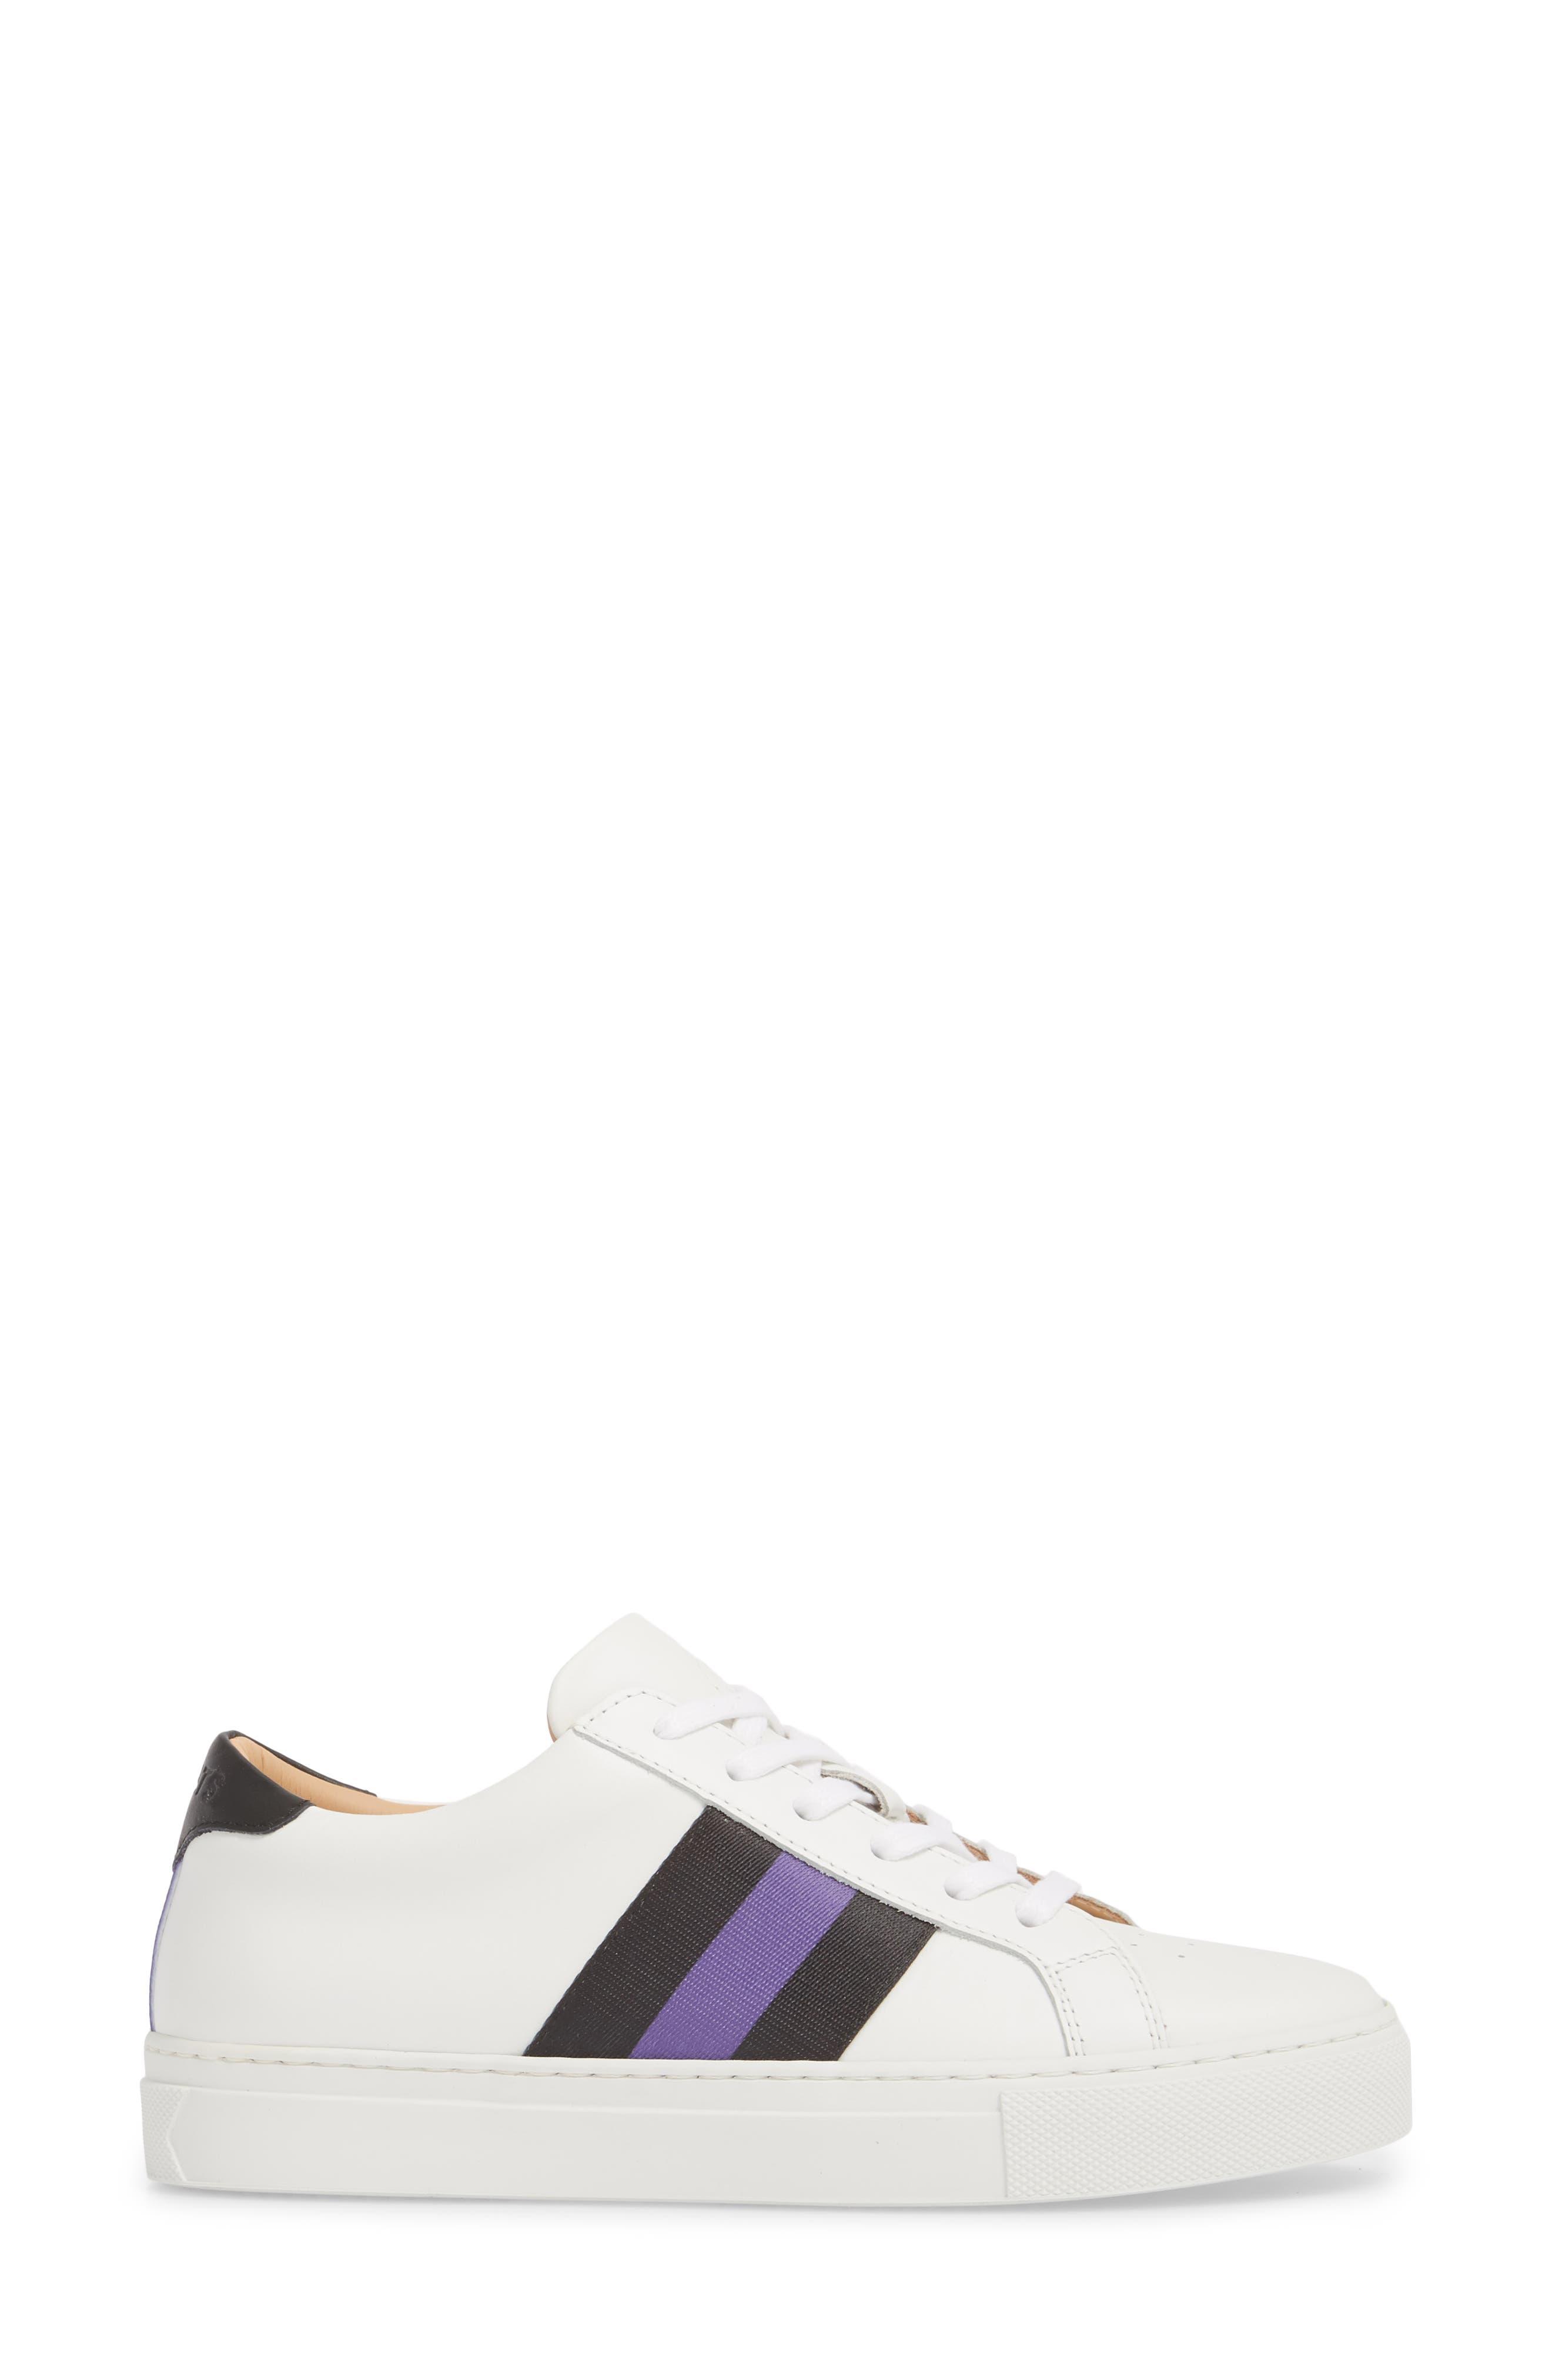 Royale Stripe Sneaker,                             Alternate thumbnail 3, color,                             WHITE/ BLACK/ VIOLET